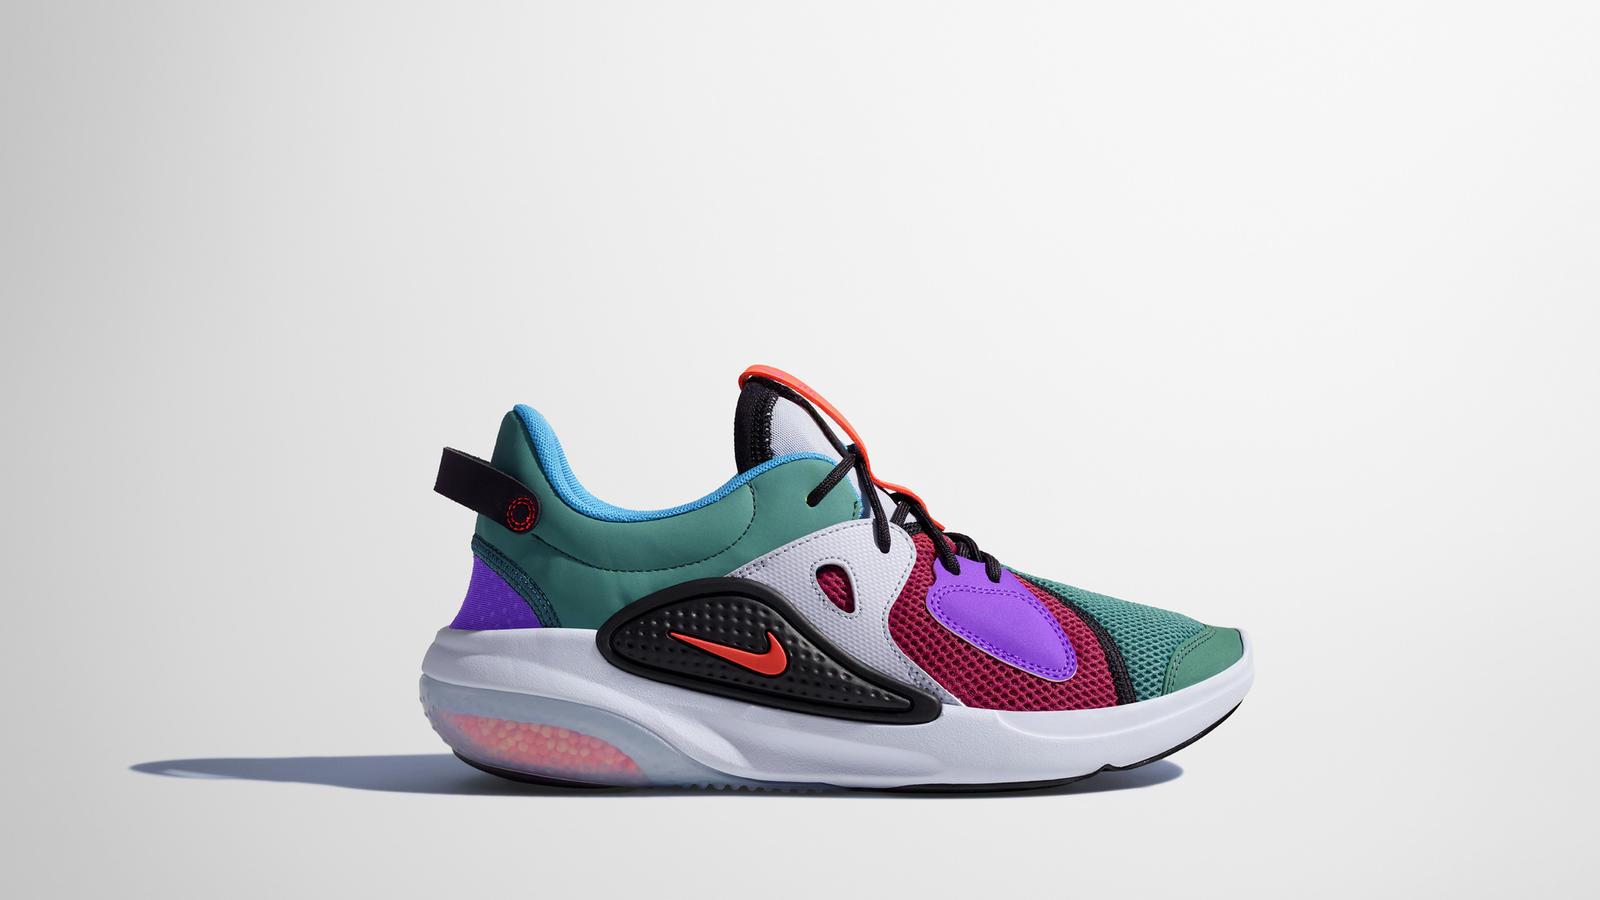 Nike Joyride NSW Official Images - Nike